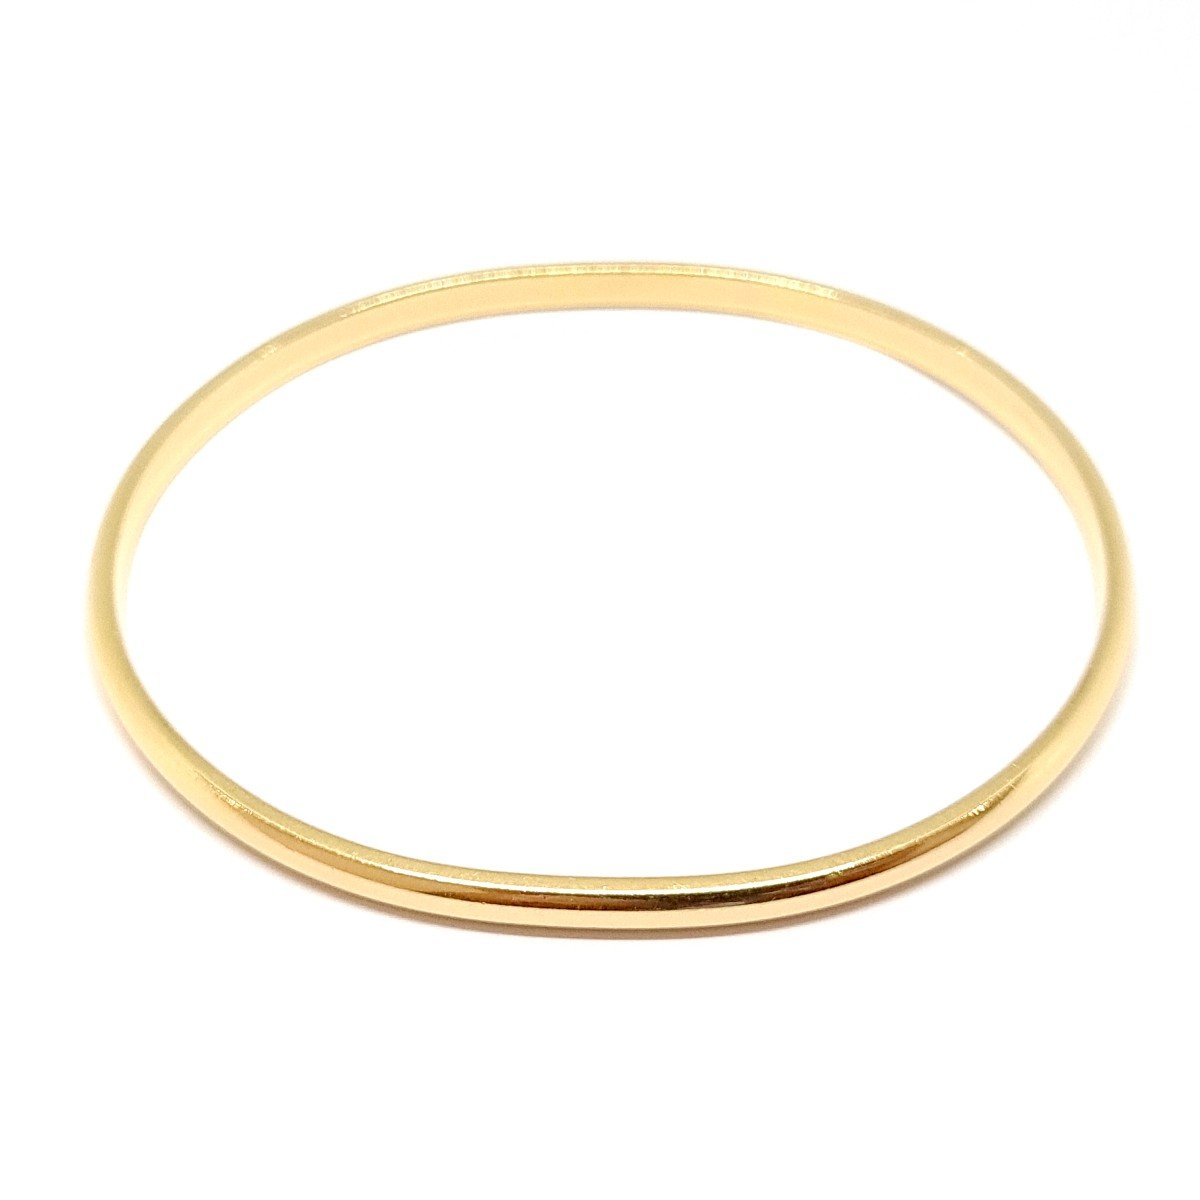 18k Yellow Gold Rigid Bangle Bracelet-photo-3